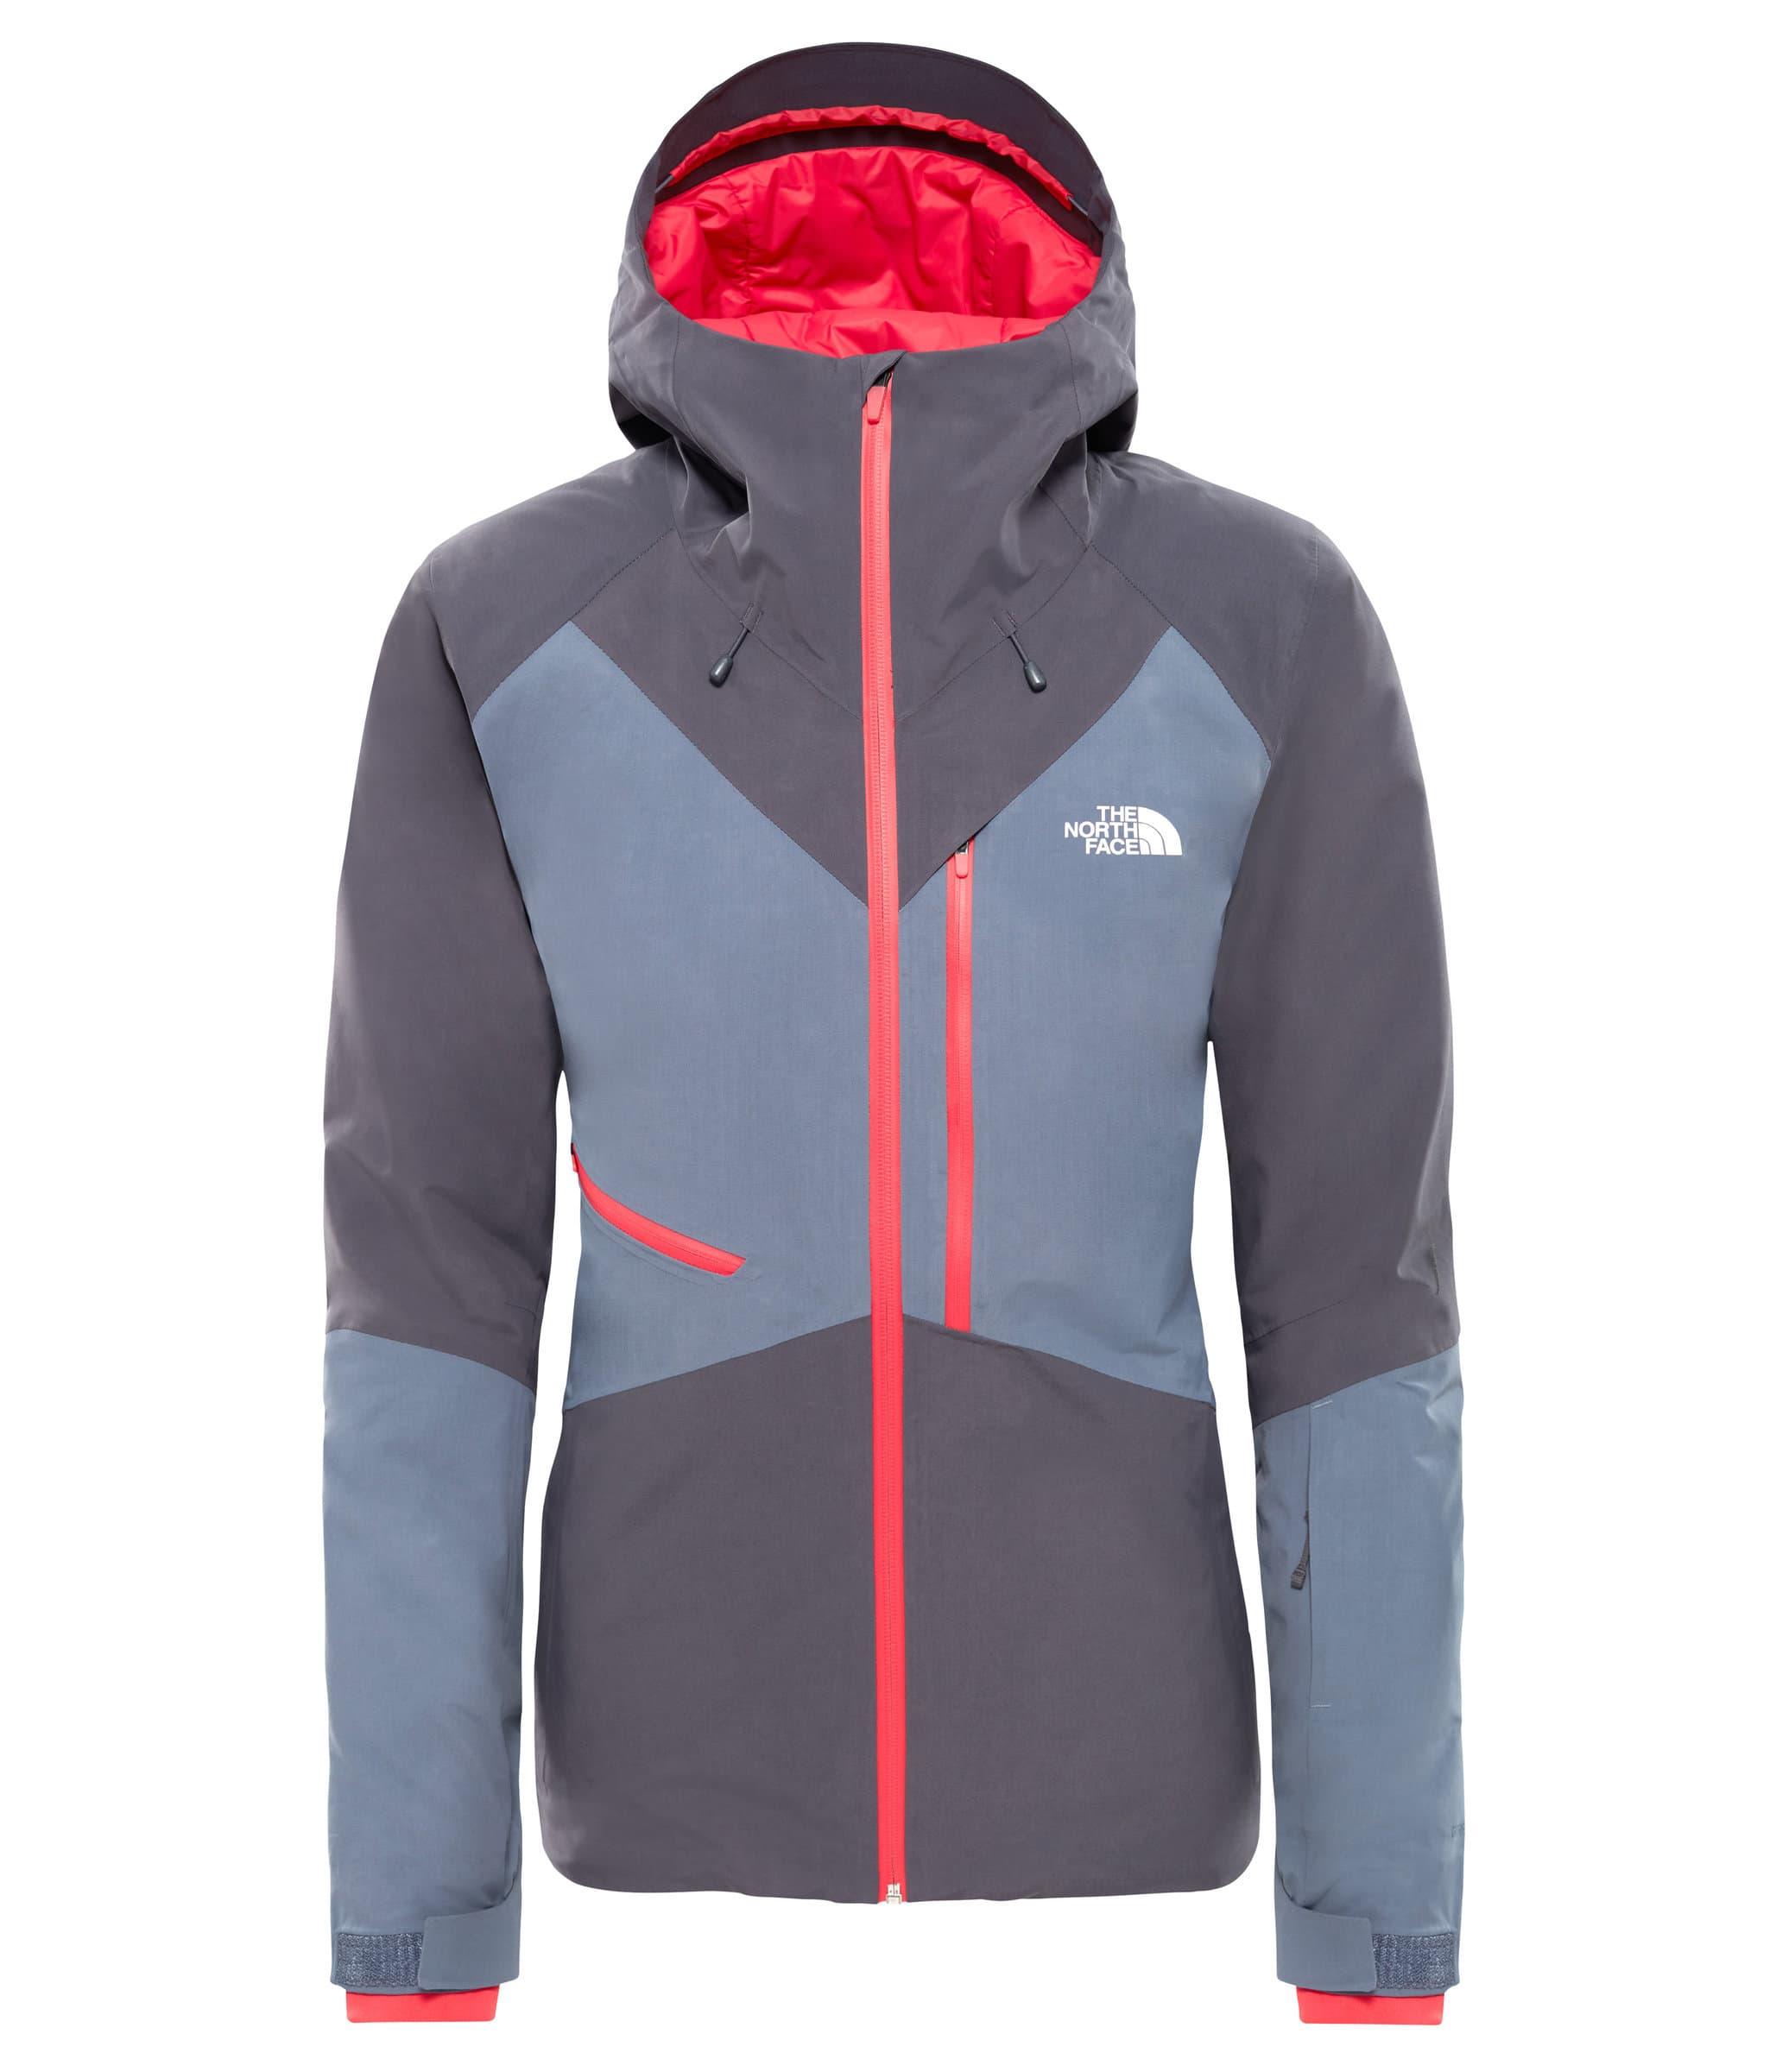 The North Face Lostrail Jacket Giacca da sci da donna  c873380d81a2